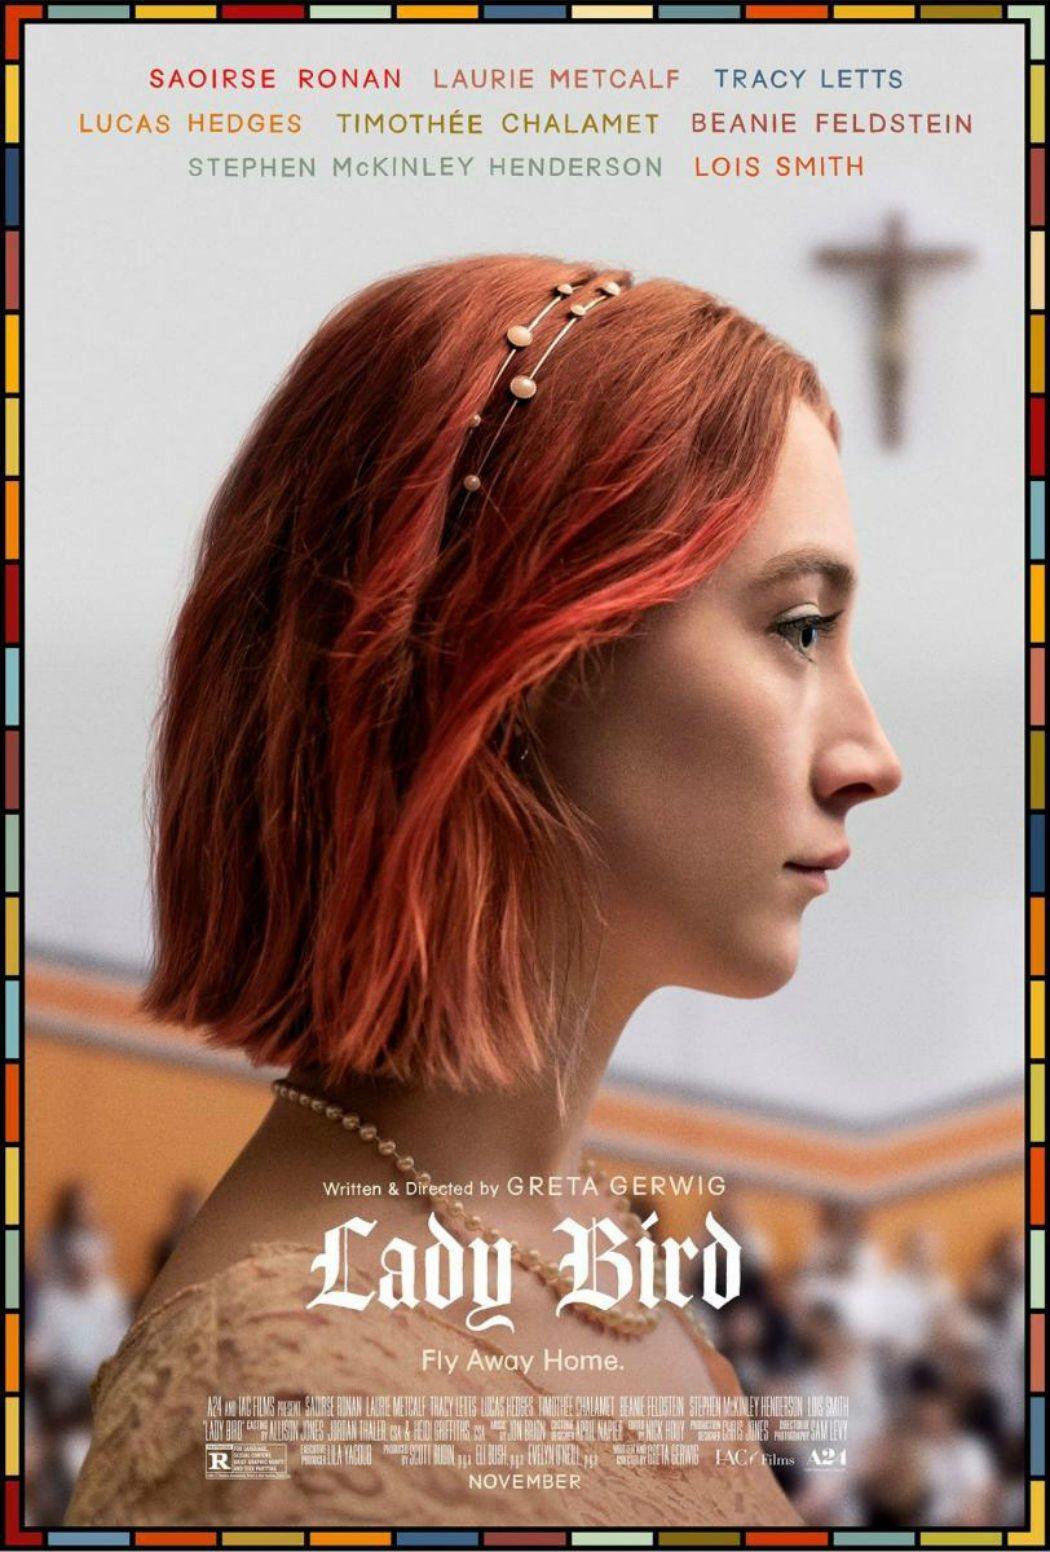 'Lady Bird' (2017)